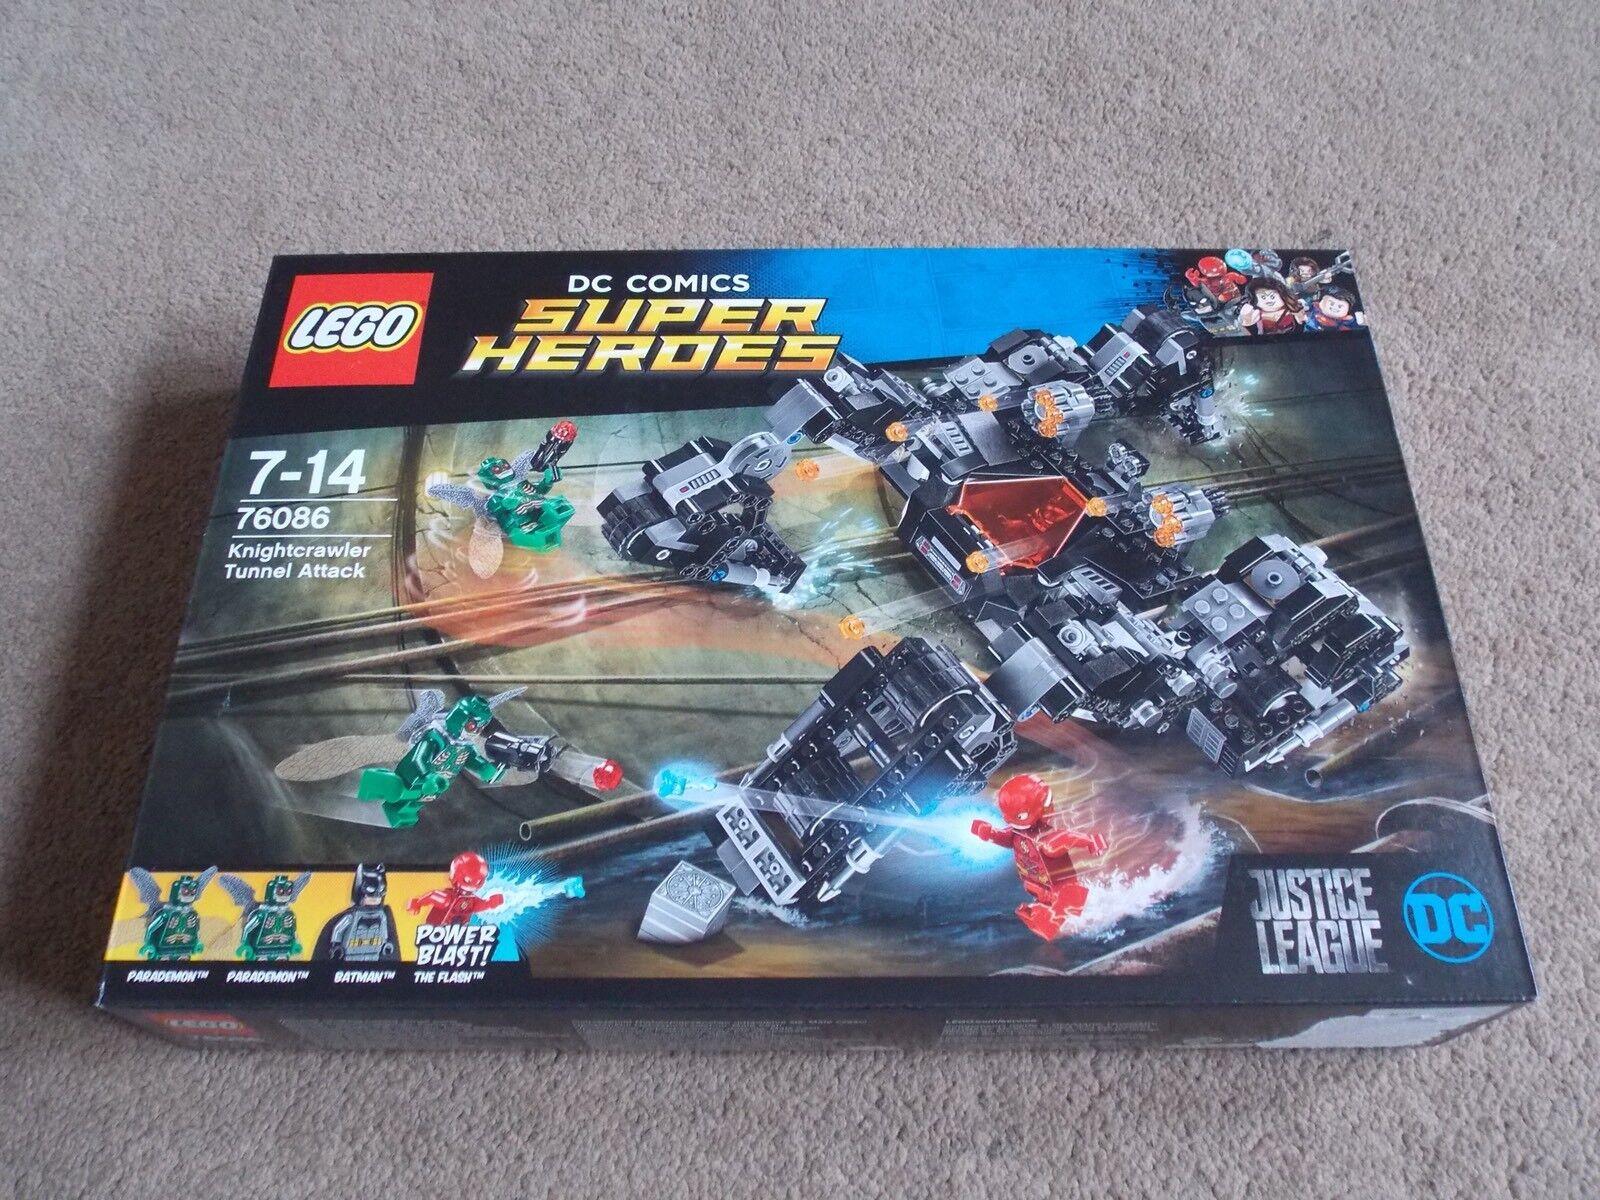 LEGO - SUPER HEROES ( SET 76086 - KNIGHTCRAWLER ) BRAND NEW